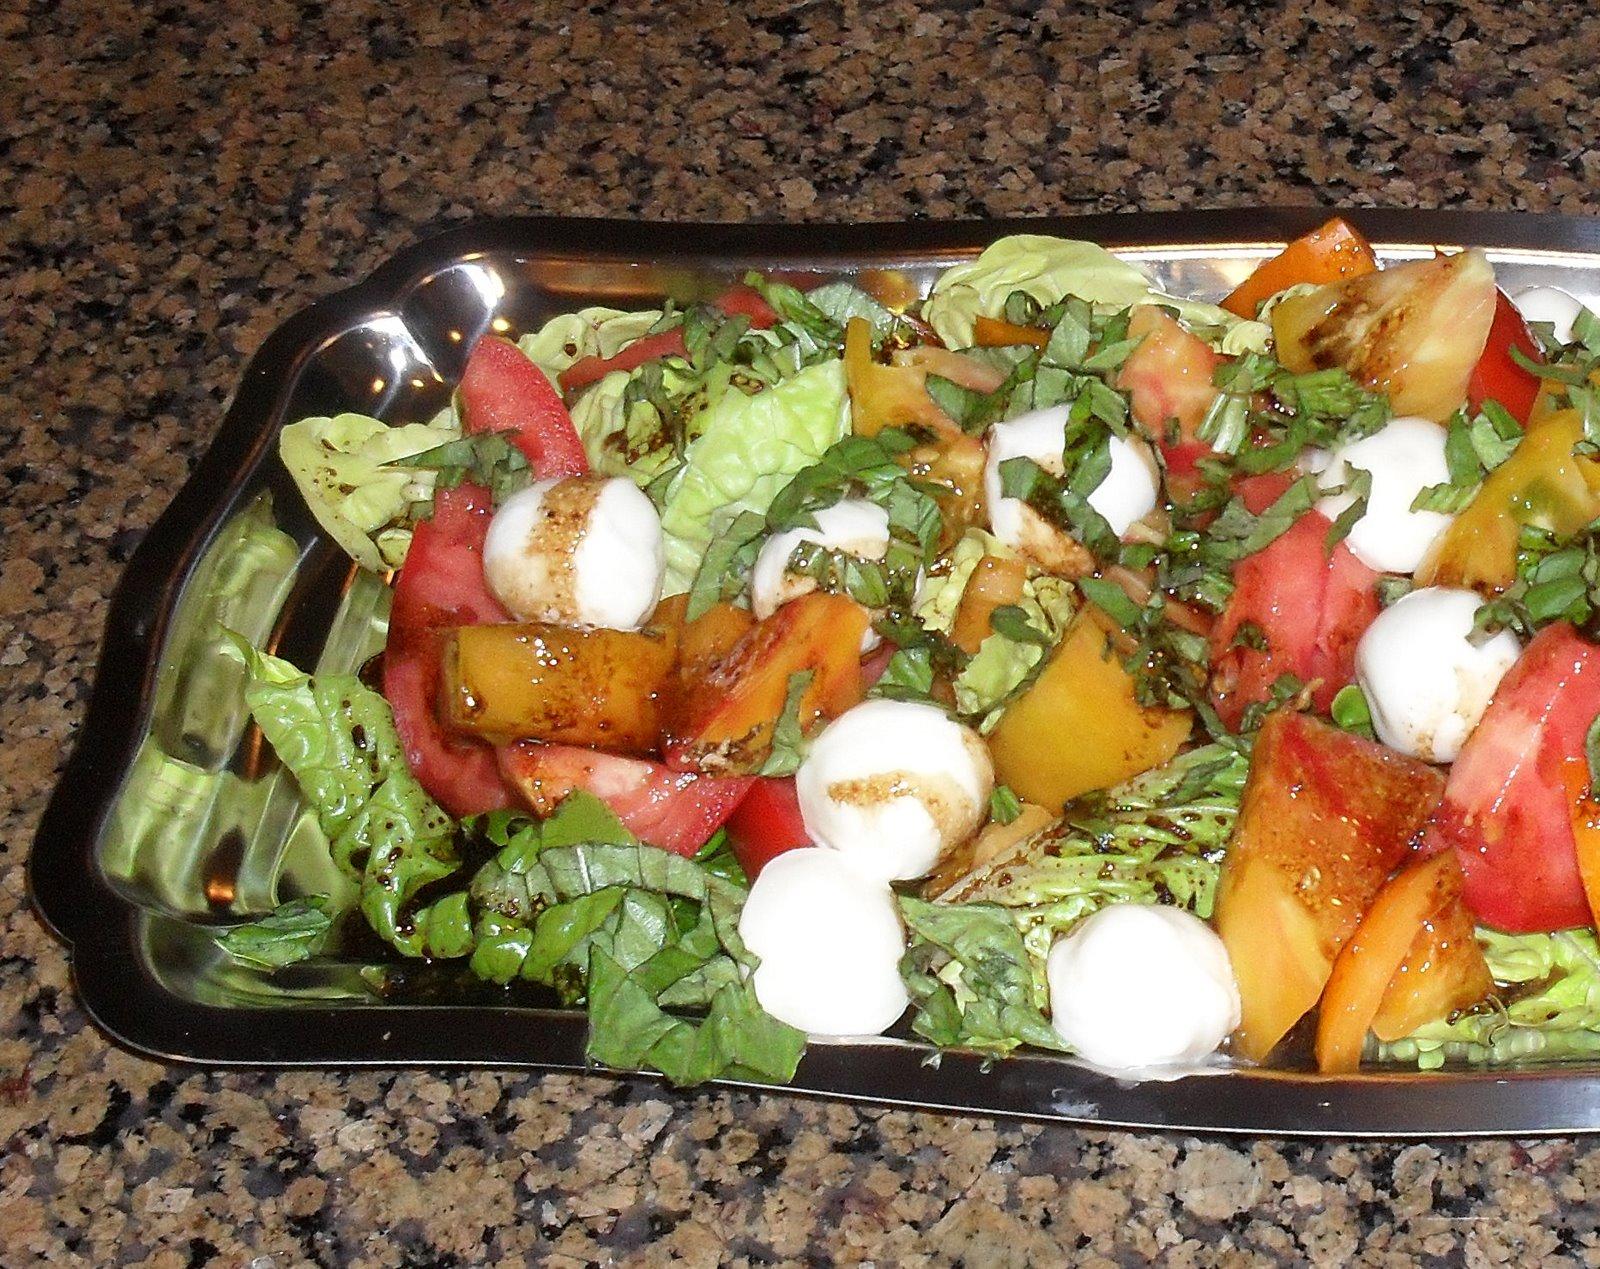 Mantia's Musings: Heirloom Tomato Caprese Salad